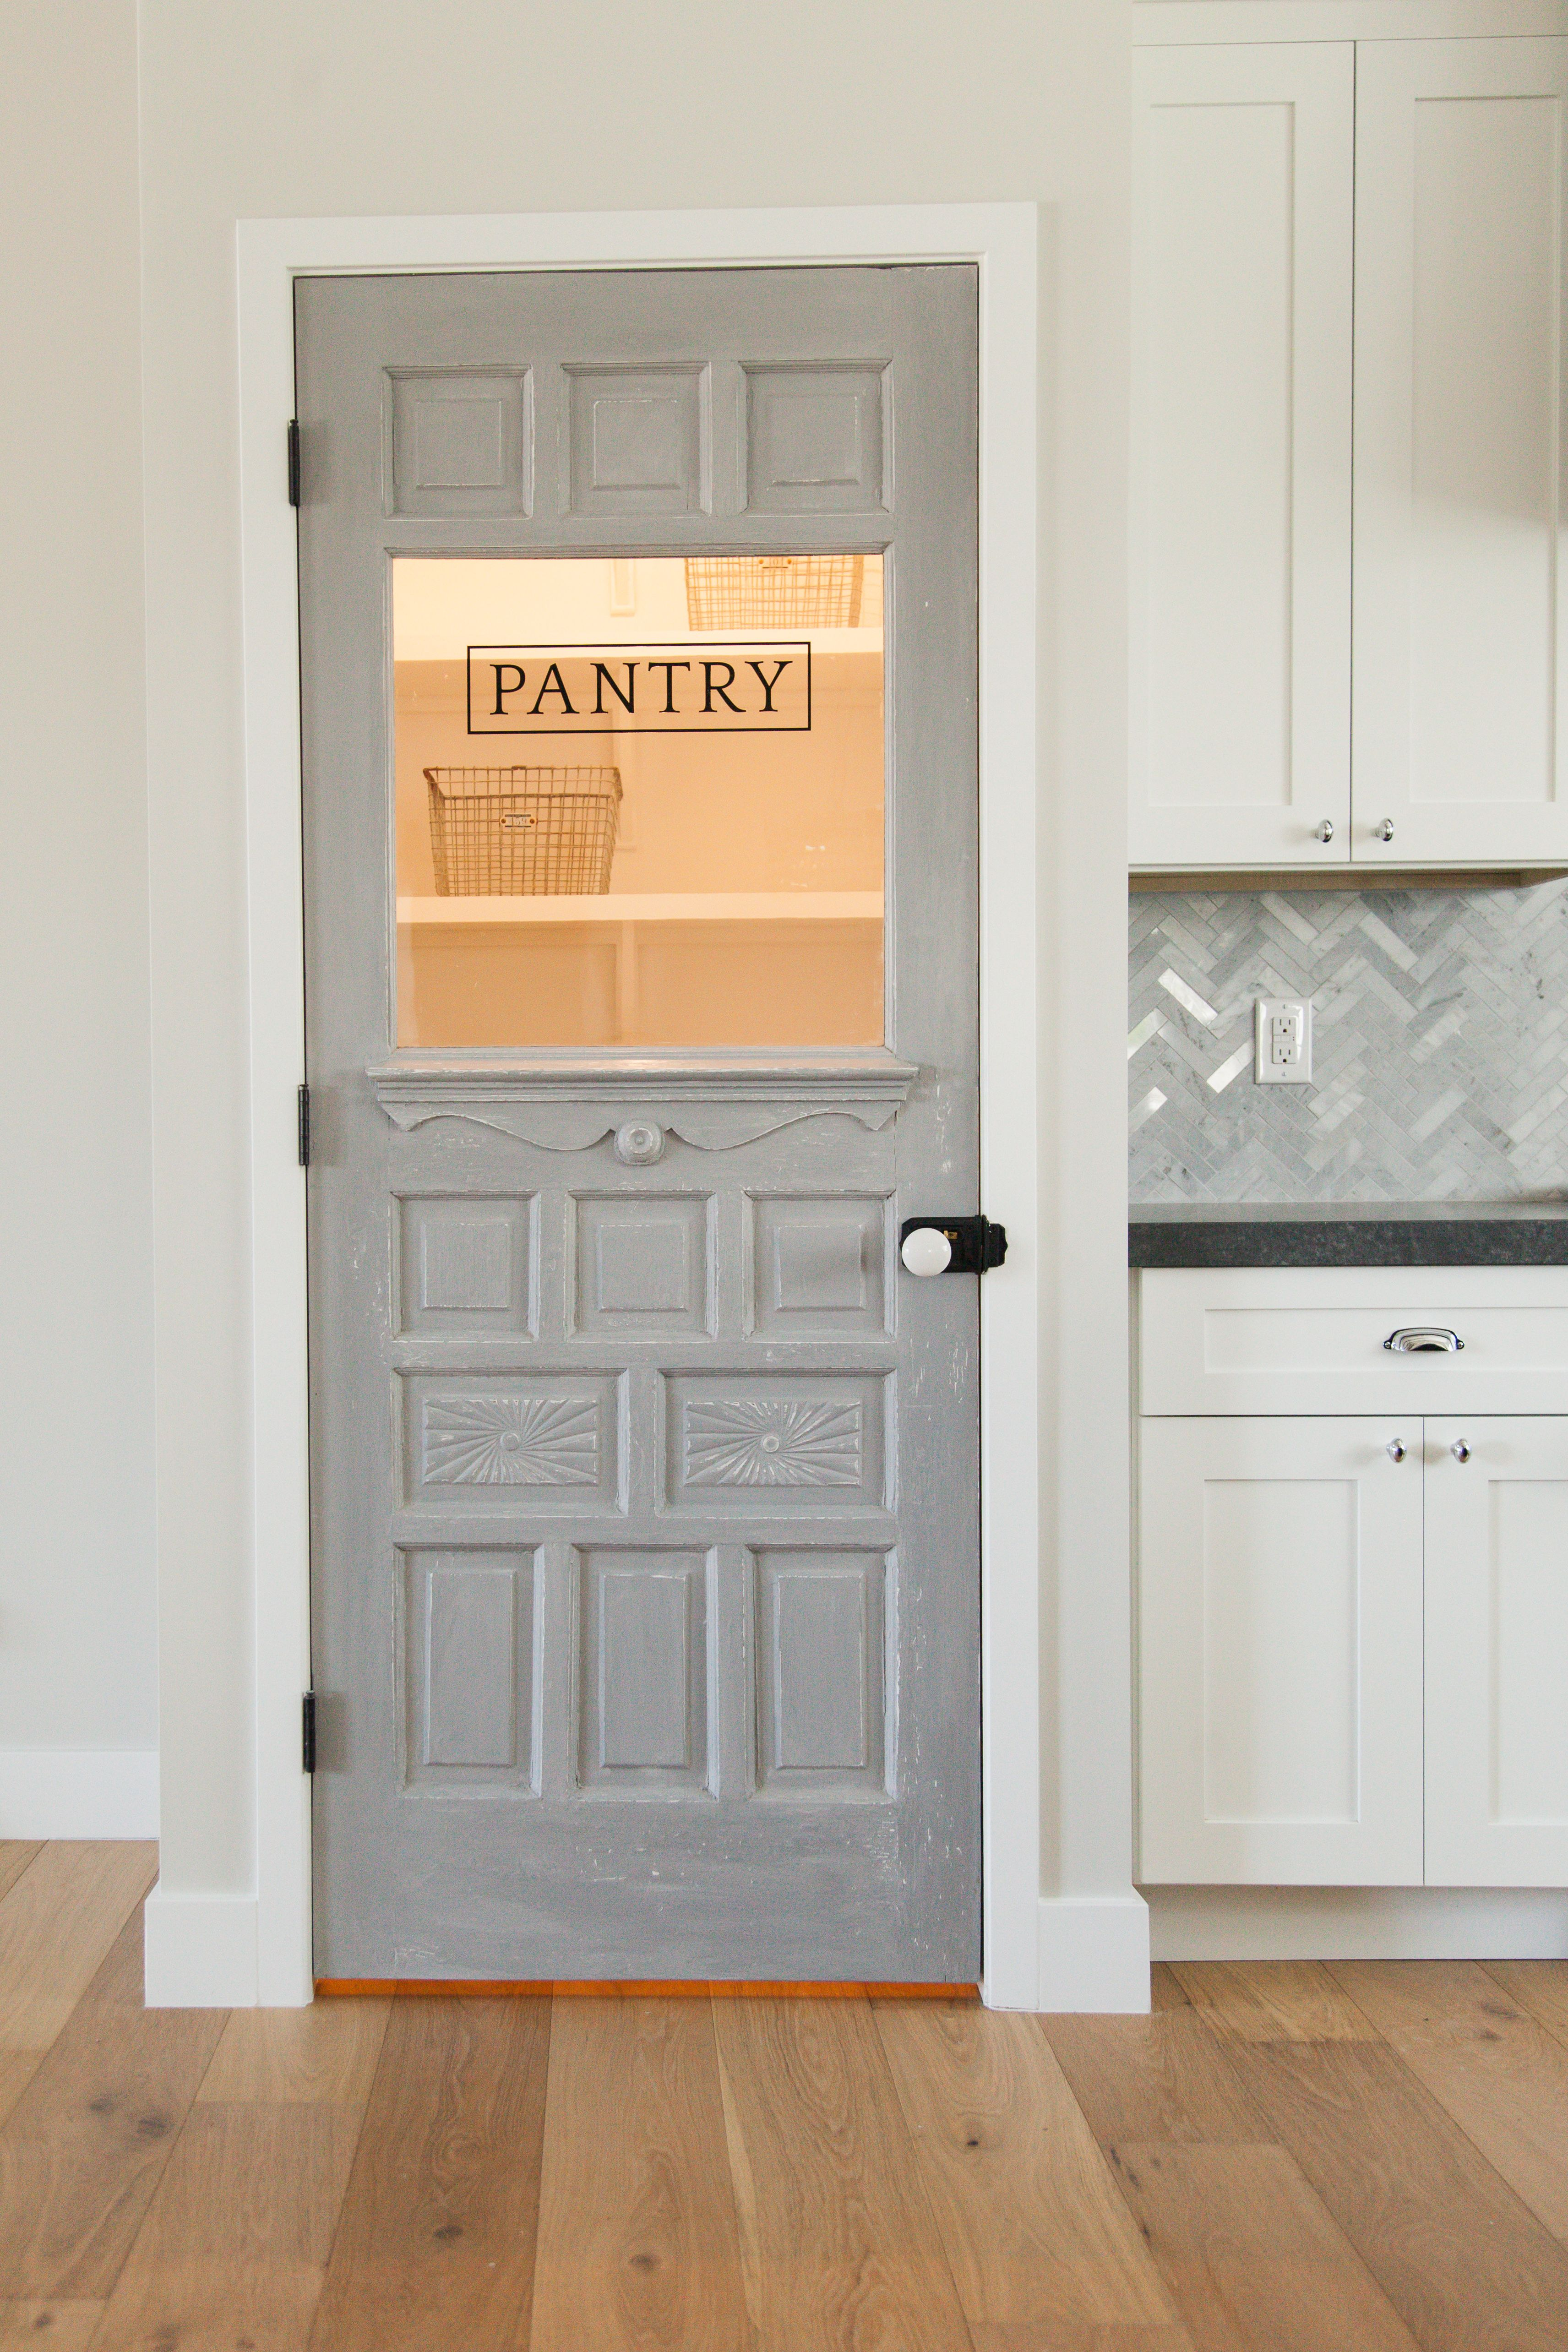 Antique Door Repurposed As A Pantry Door By Rafterhouse Phoenix Az Rustic Pantry Door Painted Pantry Doors Rustic Pantry